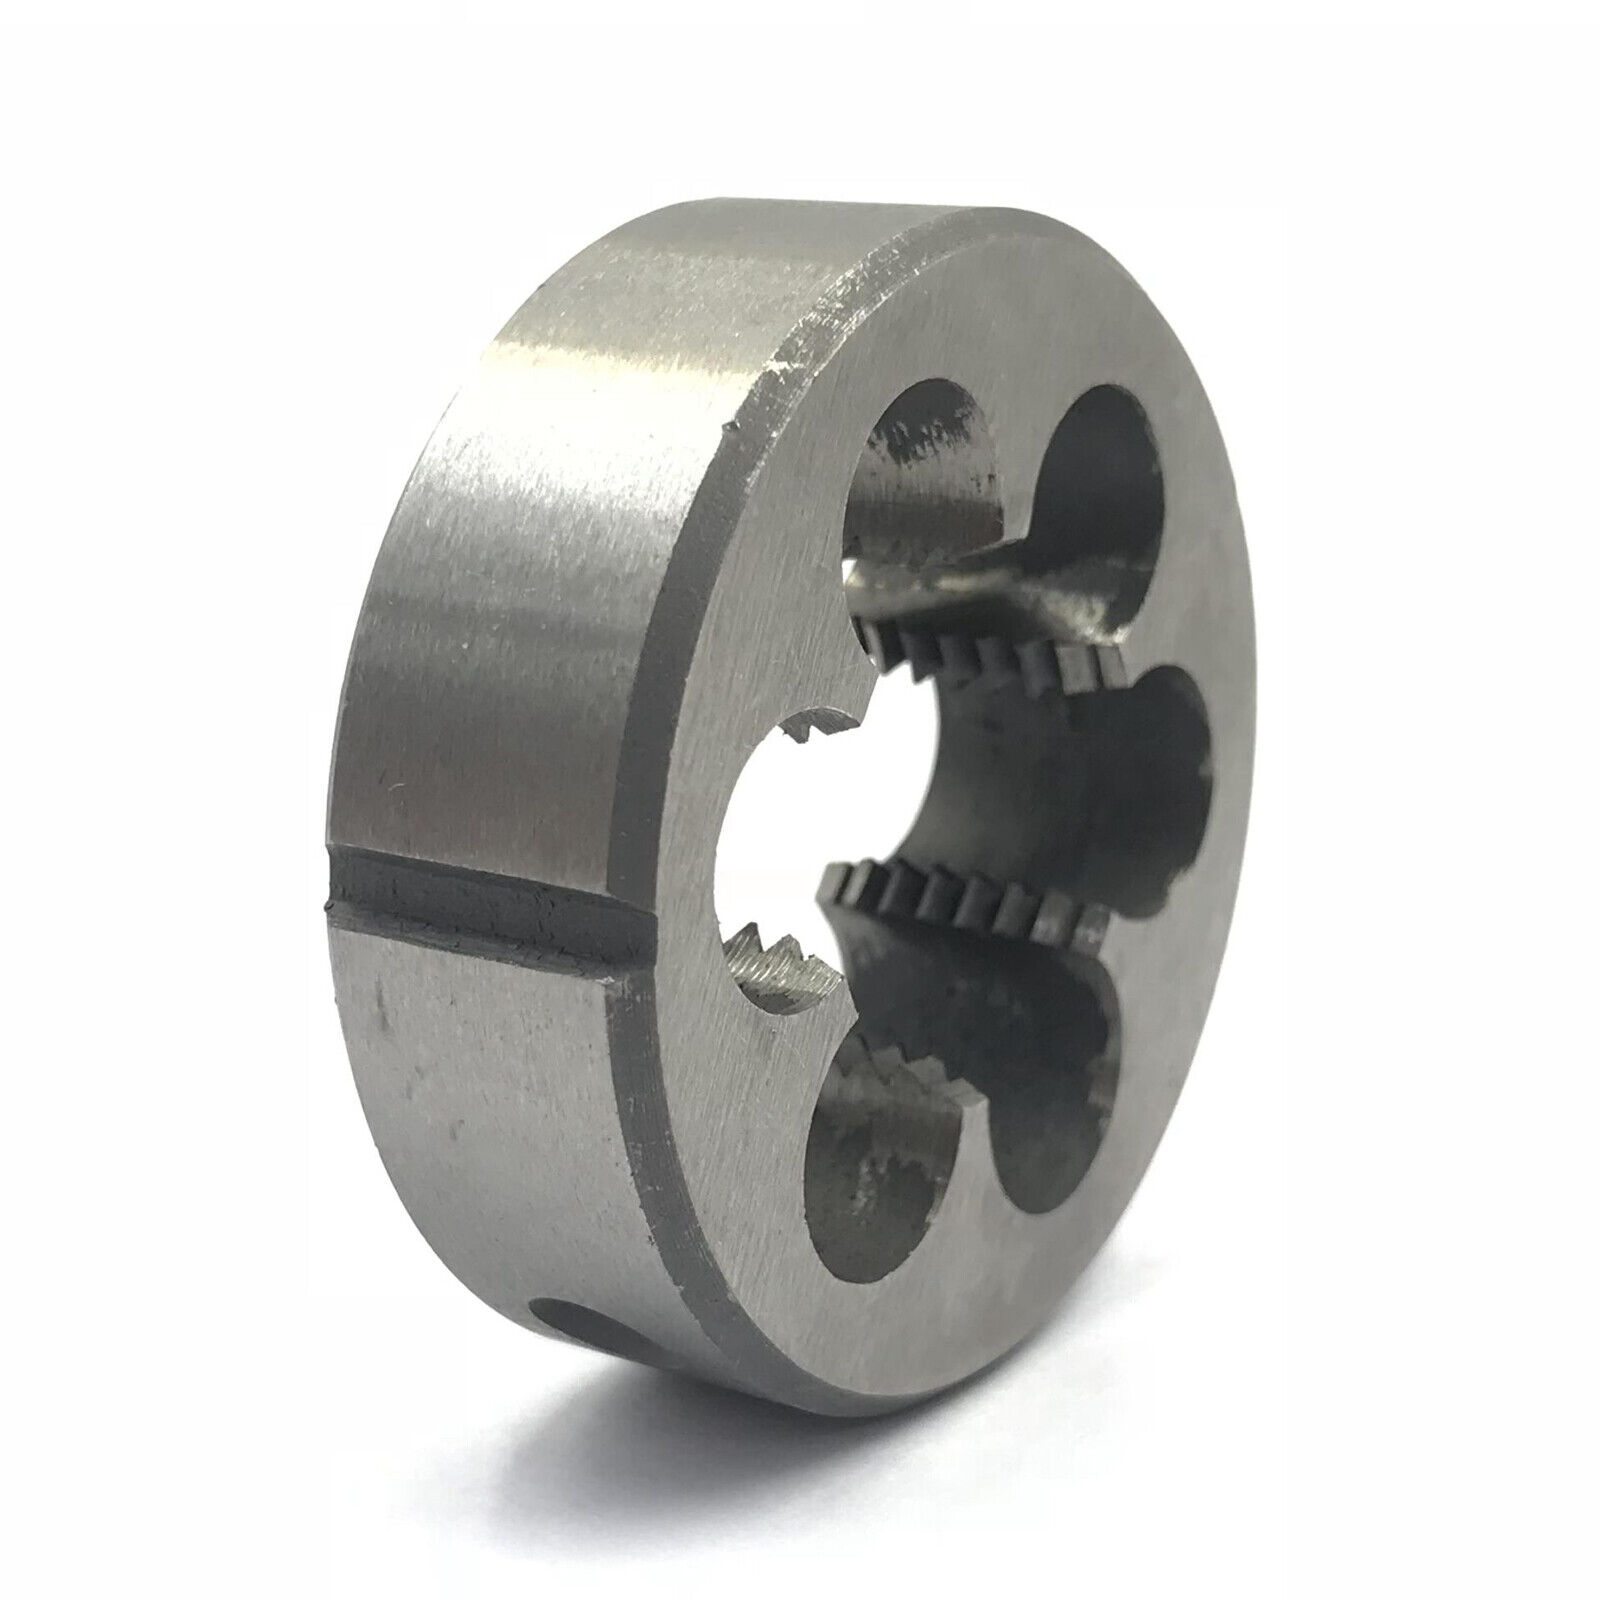 1pcs 20mm x 2.0 Metric Taper and Plug Tap M20 x 2  superior quality (S)